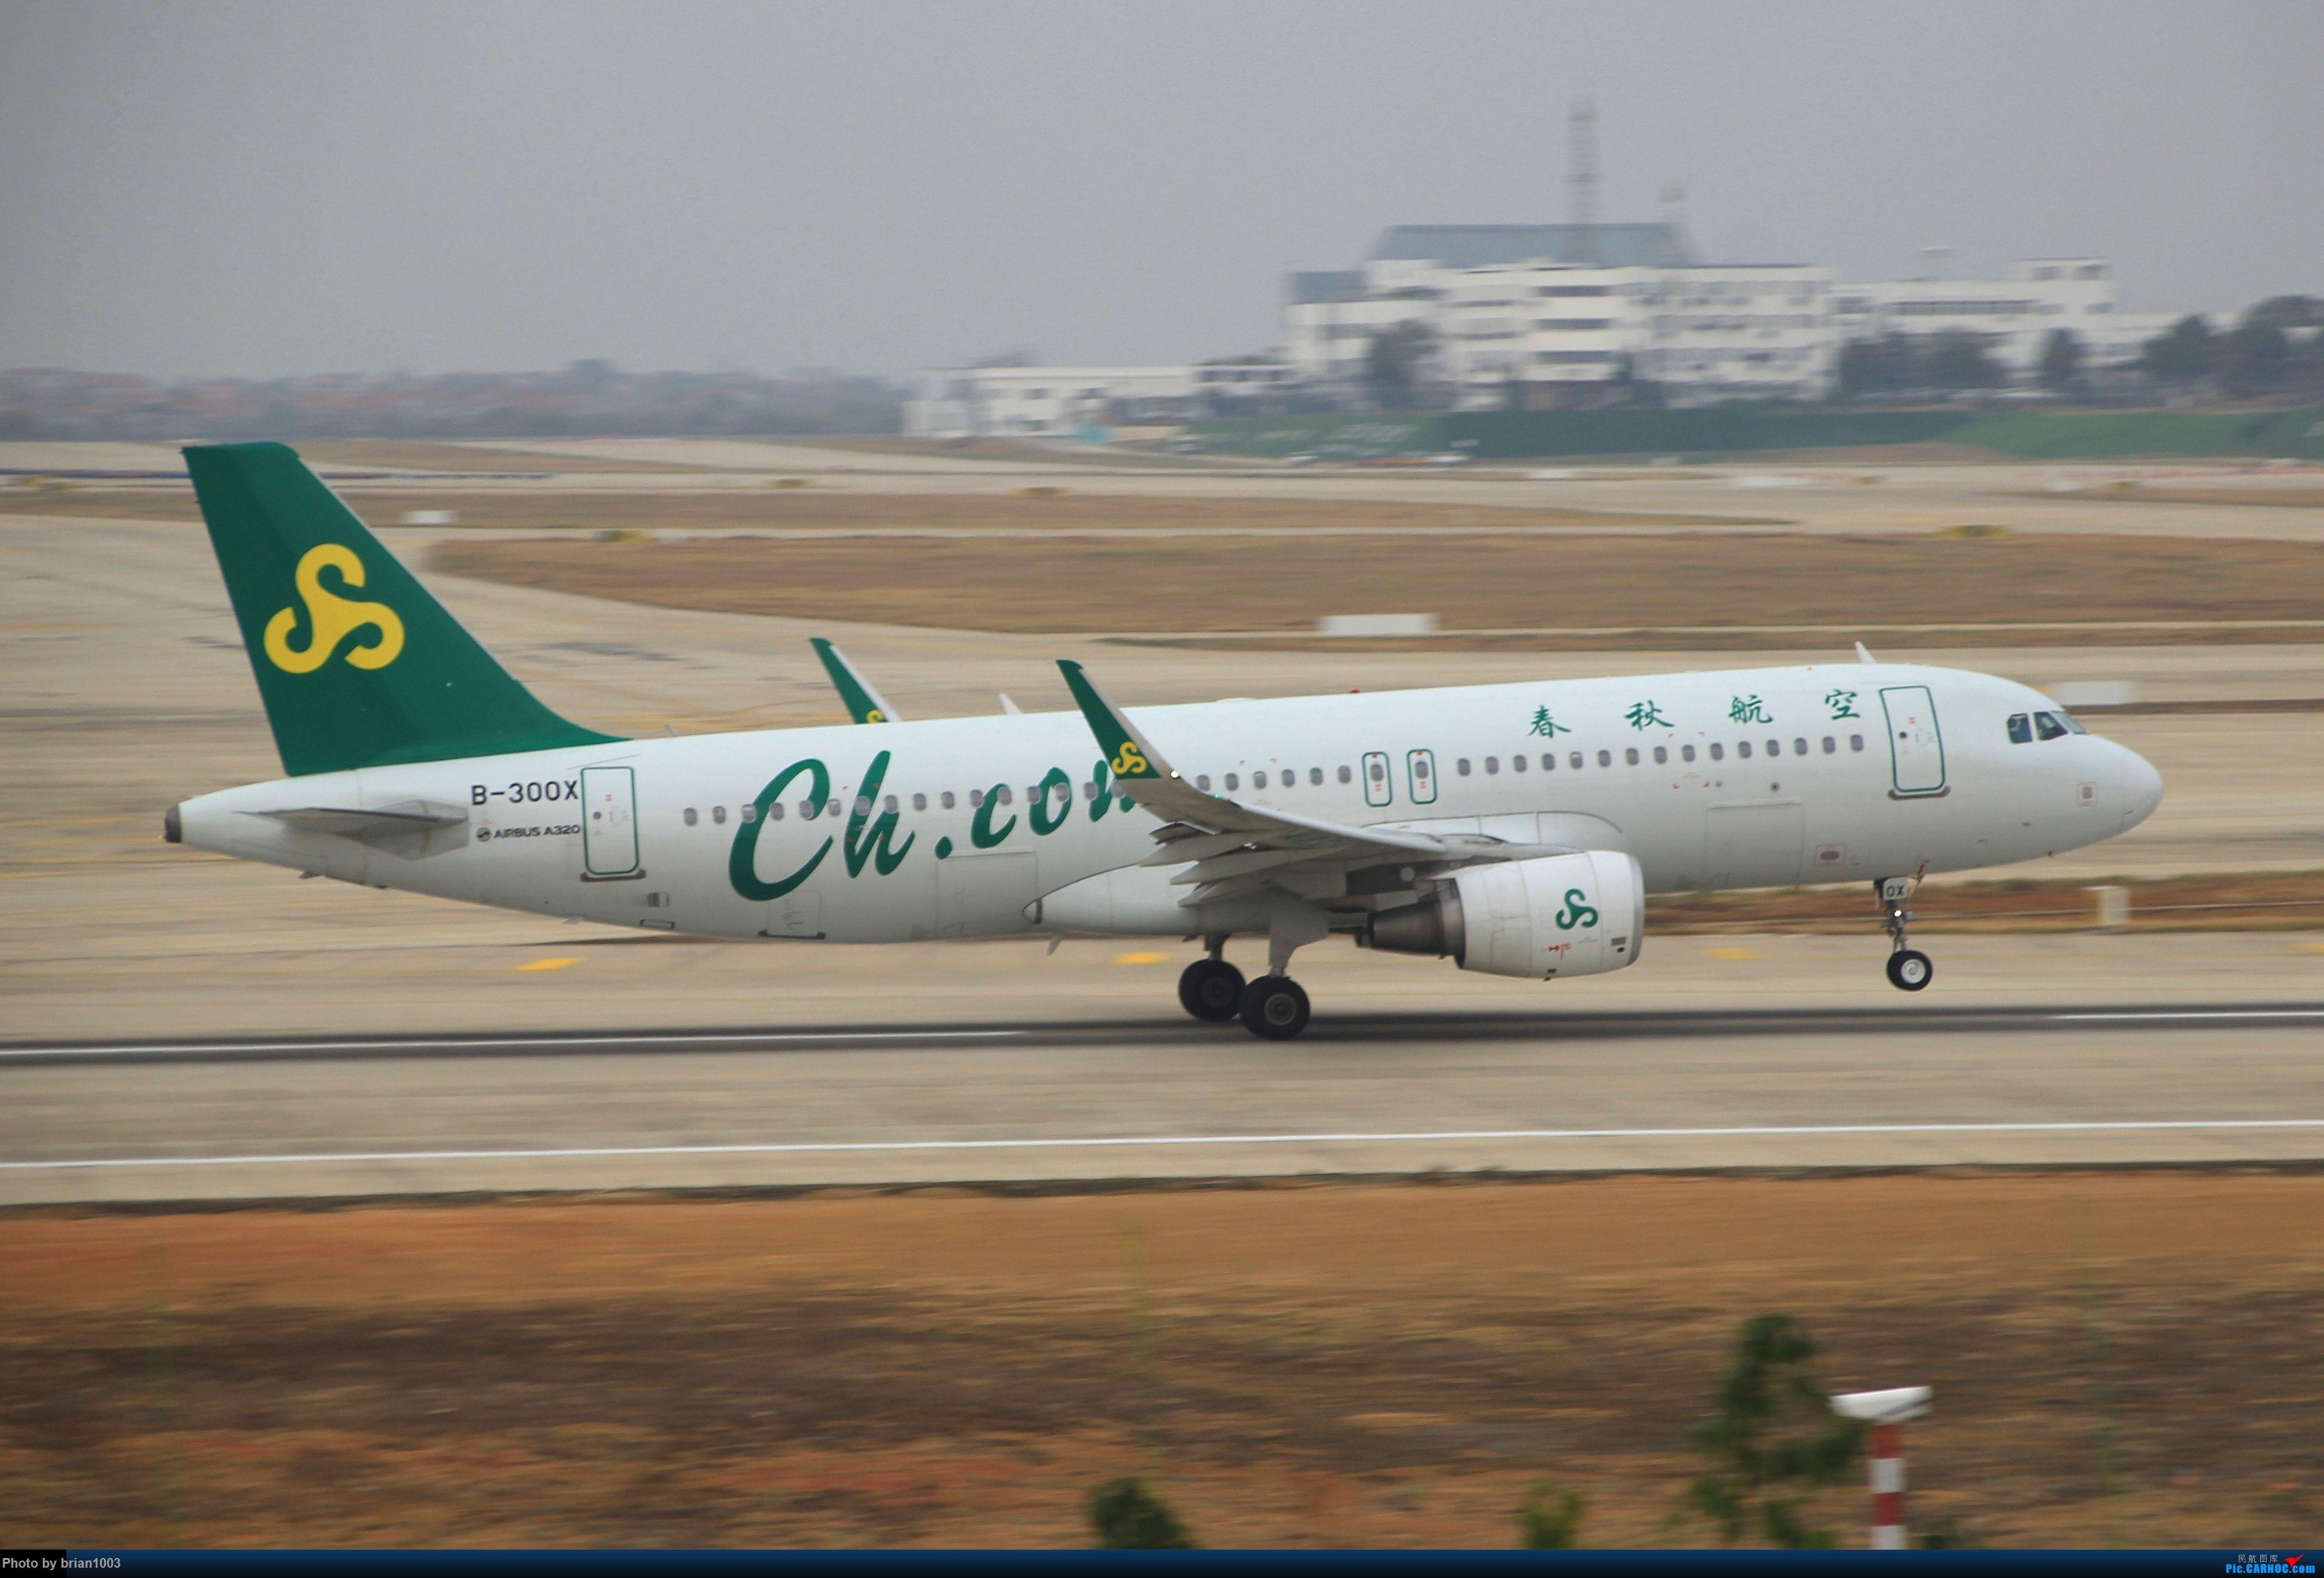 Re:[原创]WUH武汉天河机场拍机之新航季来的海航333和幸福的738 AIRBUS A320-200 B-300X 中国武汉天河国际机场